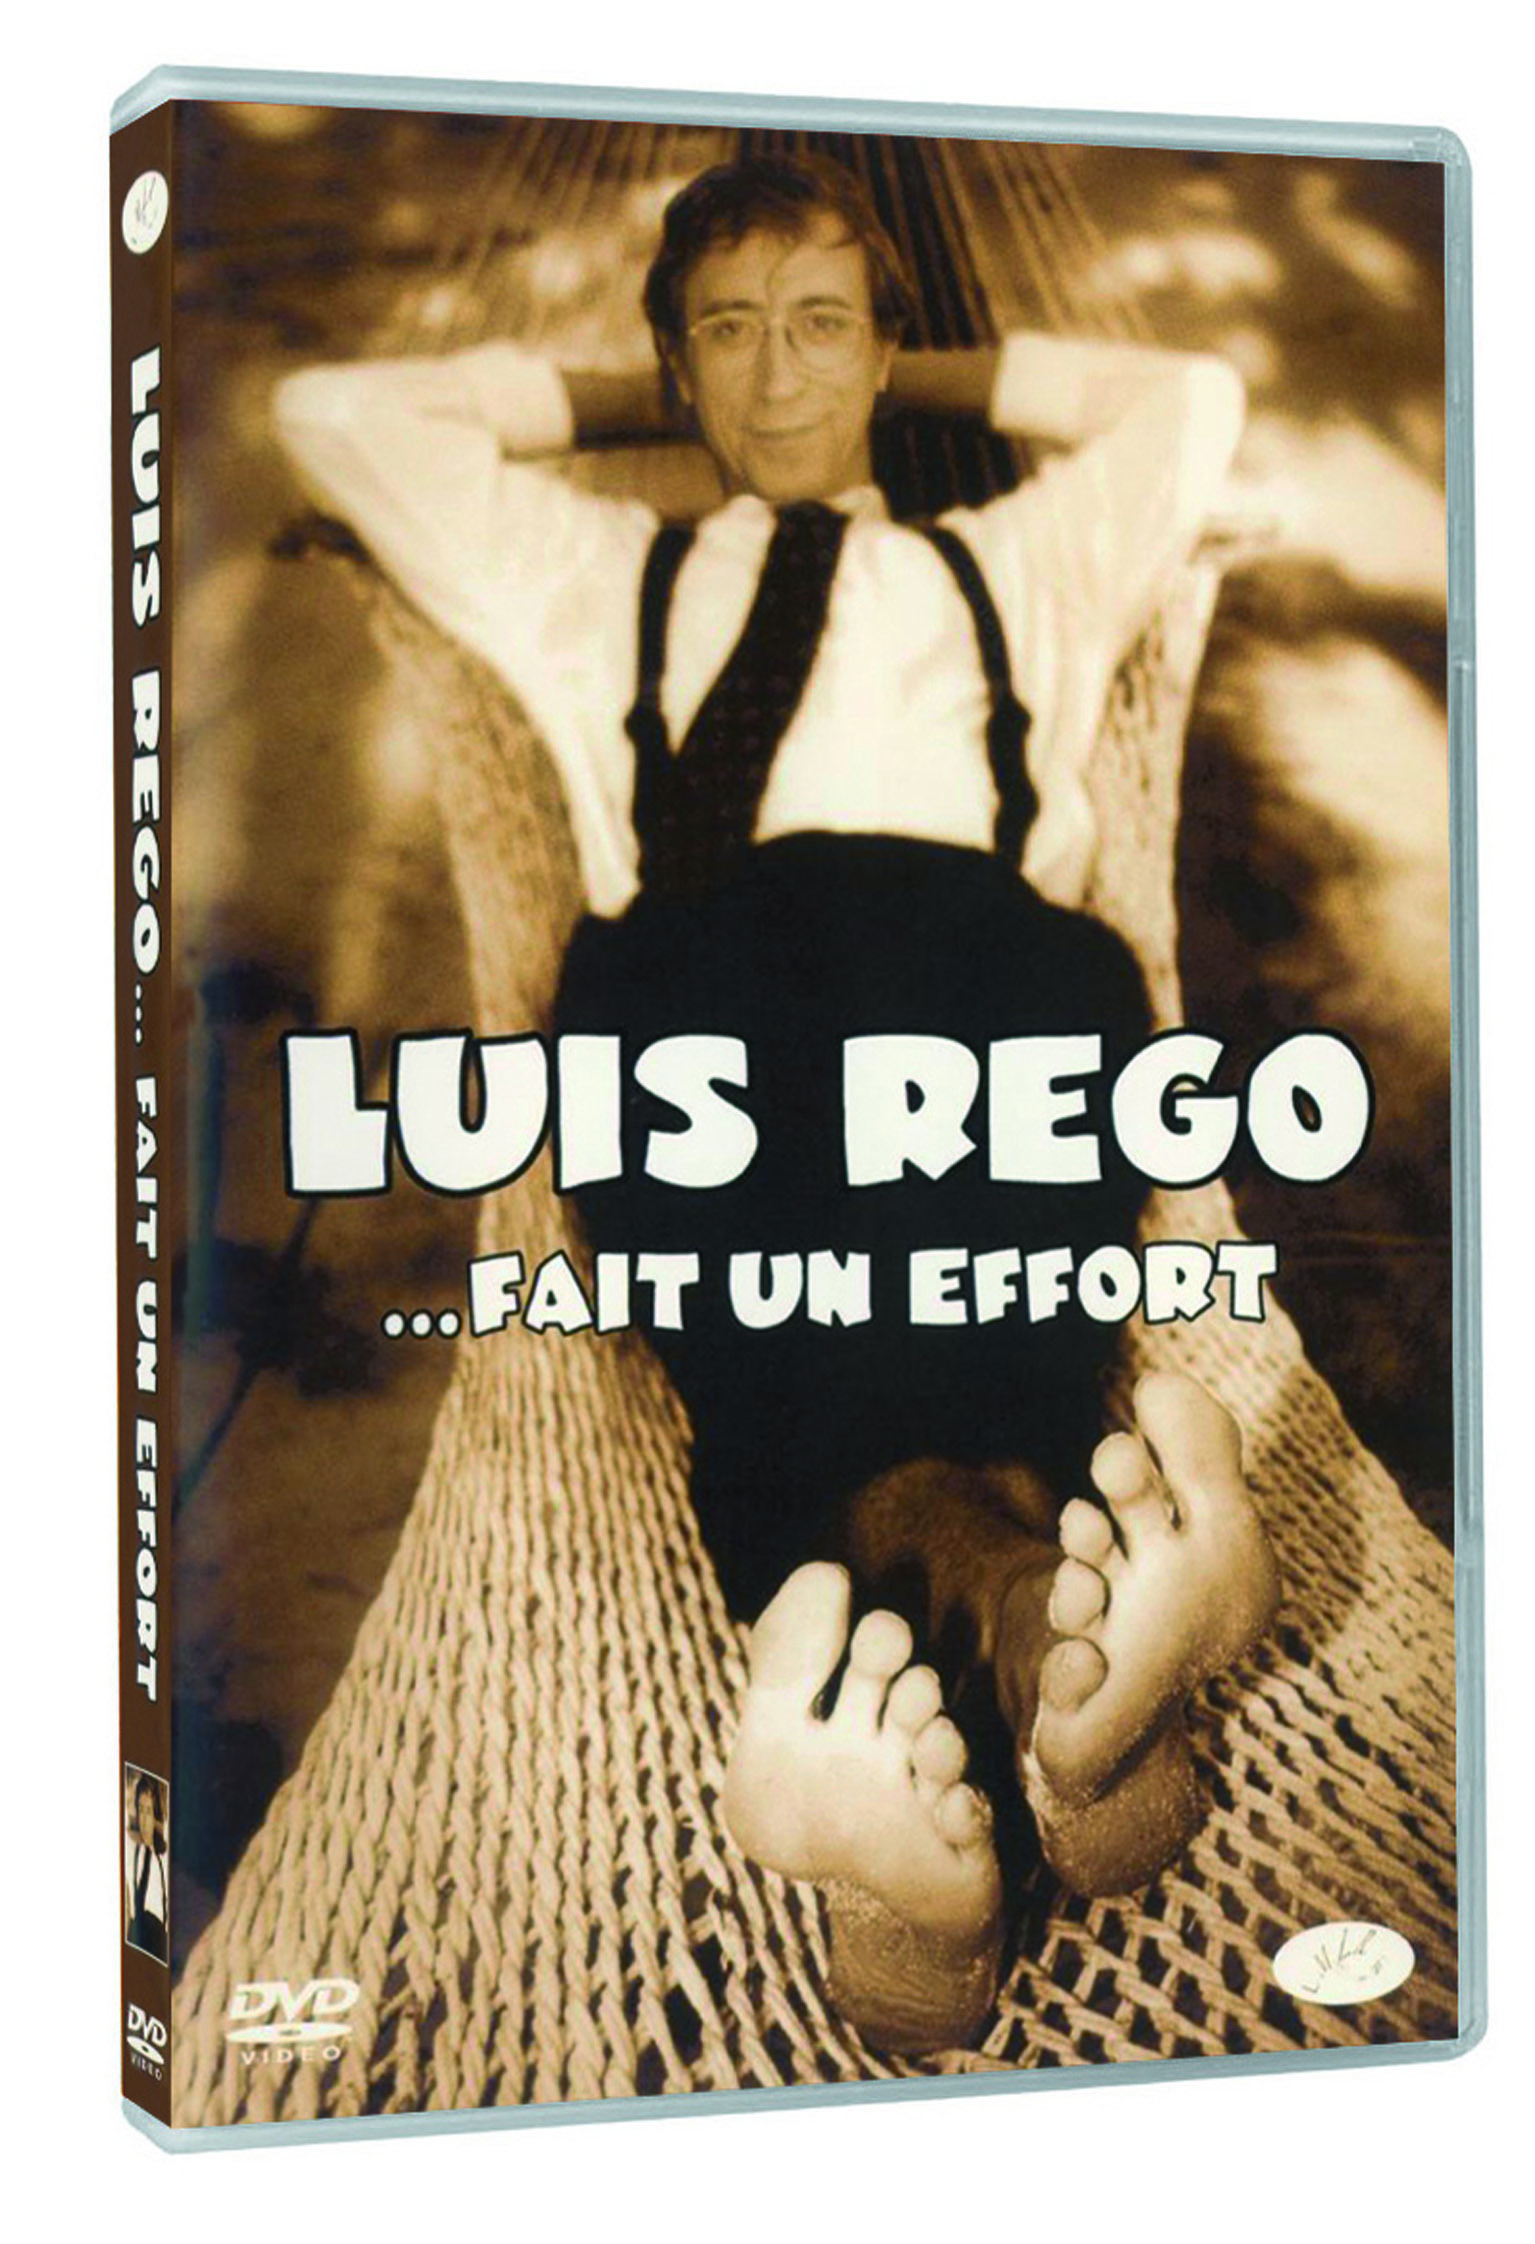 LUIS REGO. FAIT UN EFFORT-DVD